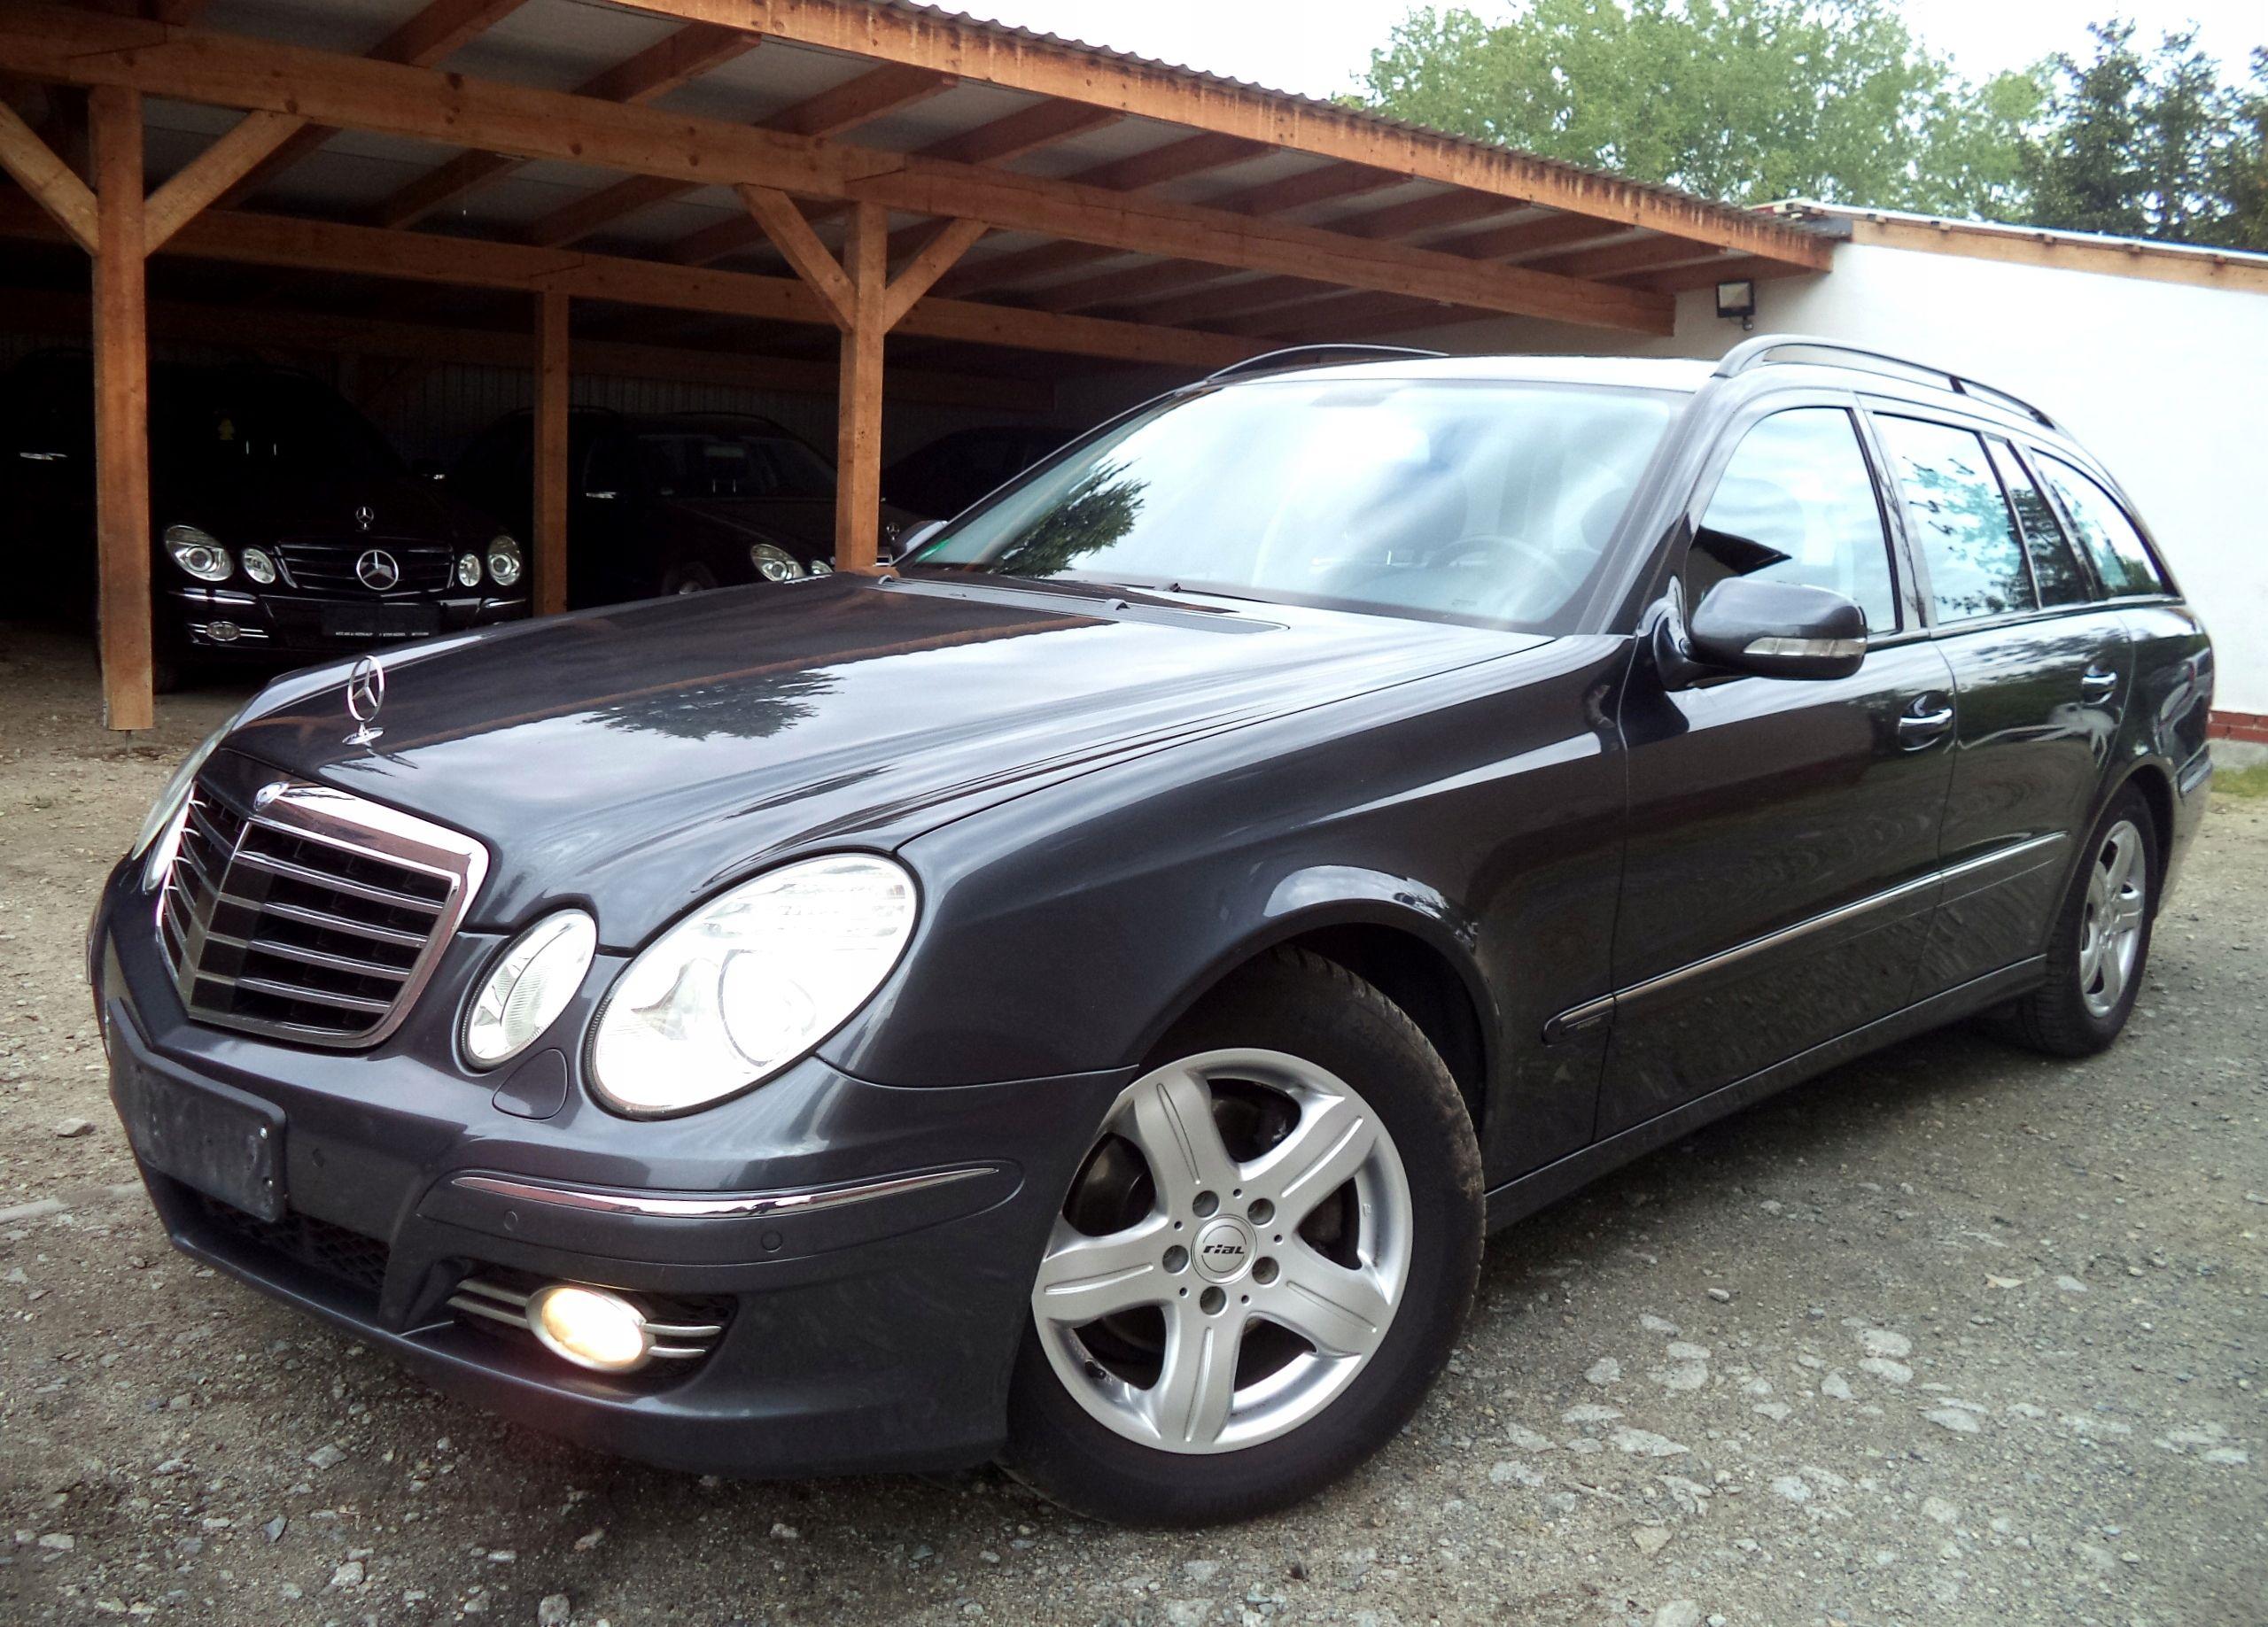 Mercedes W211 E280 Cdi V6 Avantgarde Kombi Lift 8175623708 Oficjalne Archiwum Allegro Mercedes W211 Mercedes Bmw Car